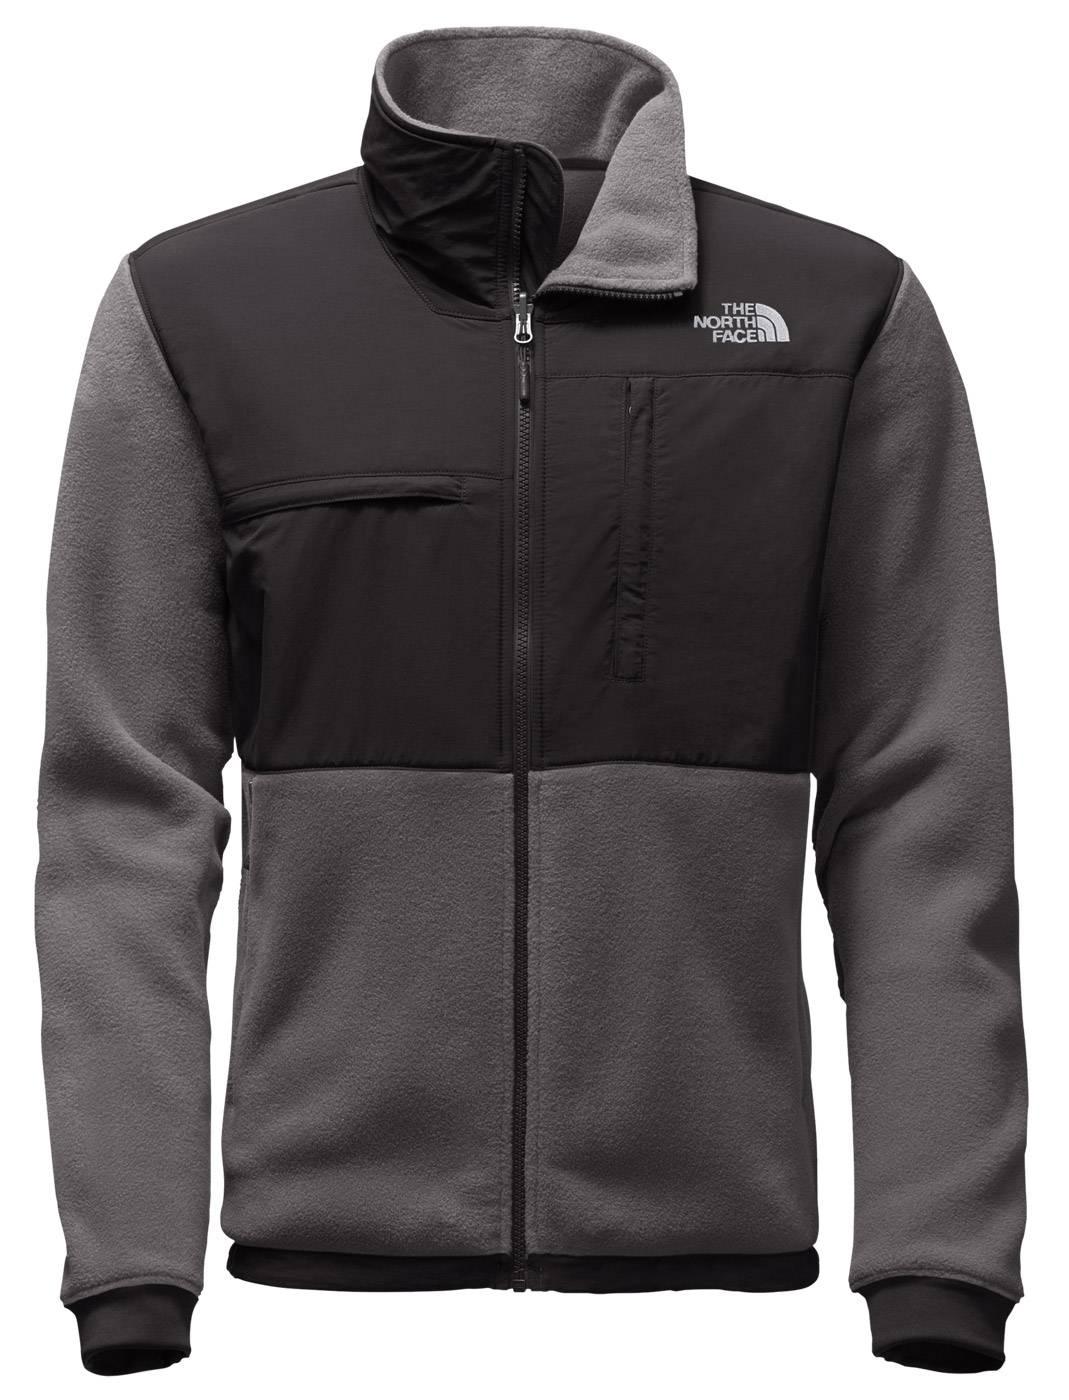 The north face custom mens denali jacket